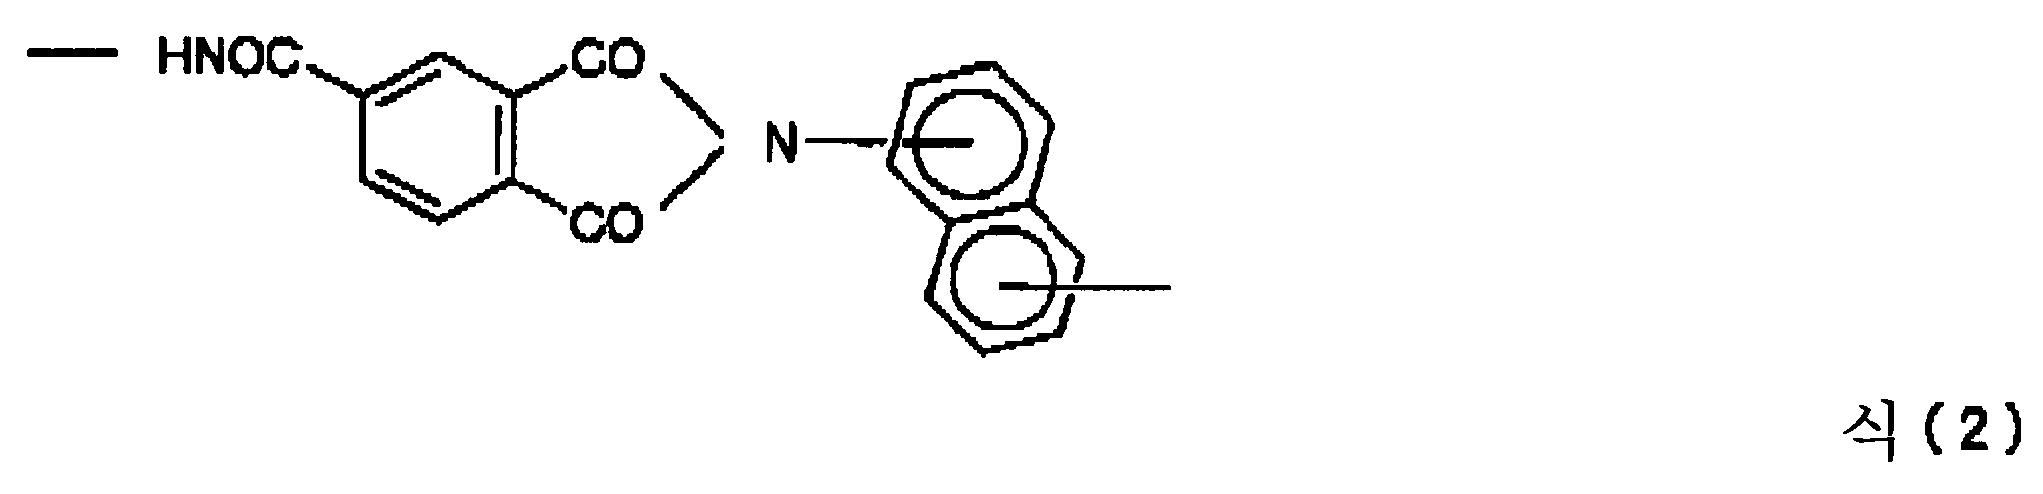 Figure 112006017410777-pat00011